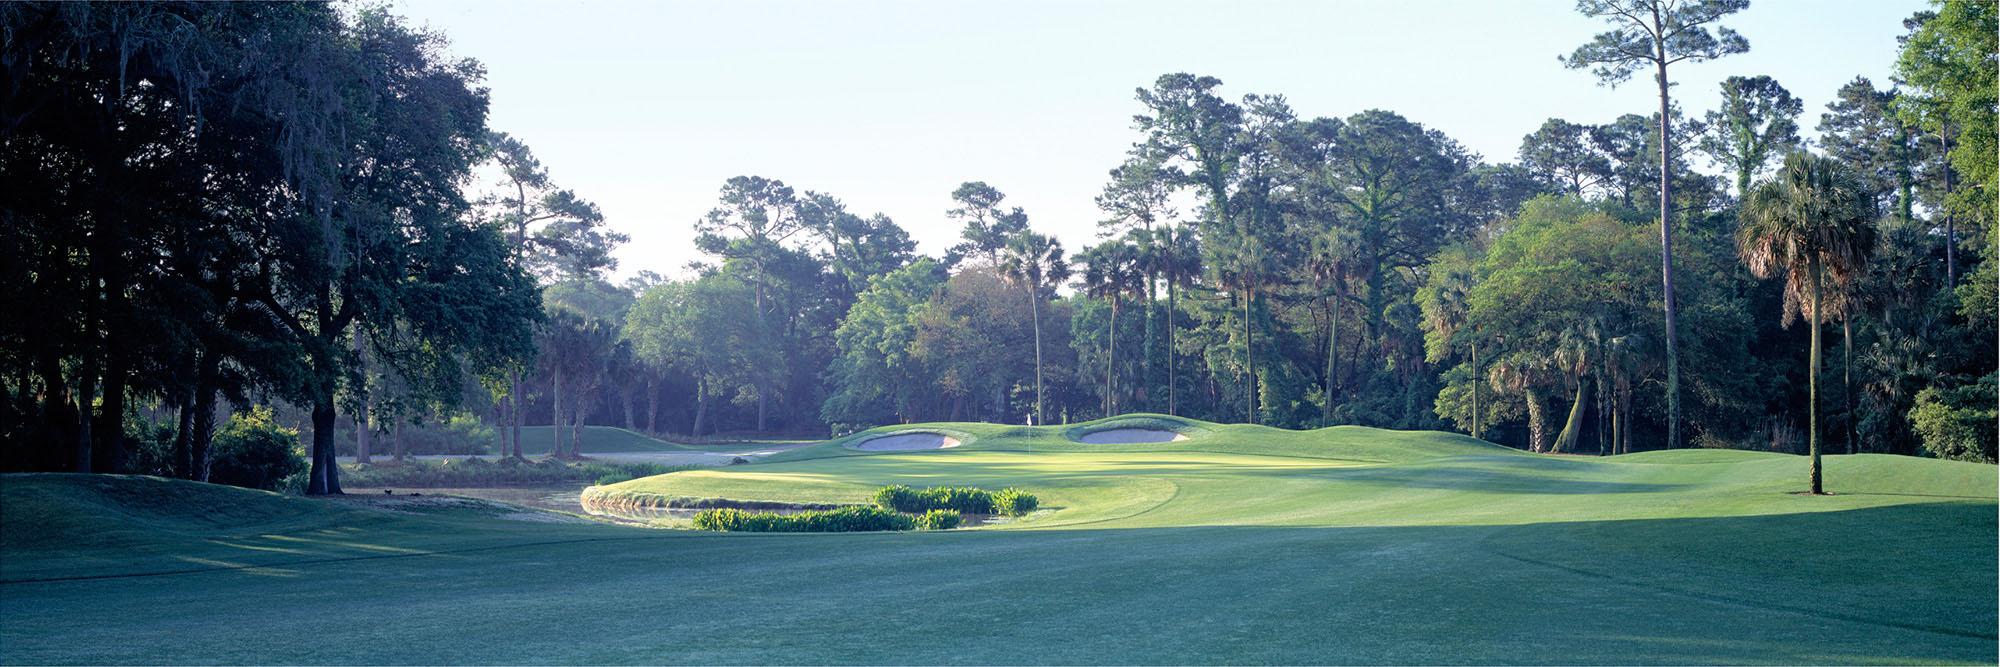 Golf Course Image - Kiawah Cougar Point No. 7